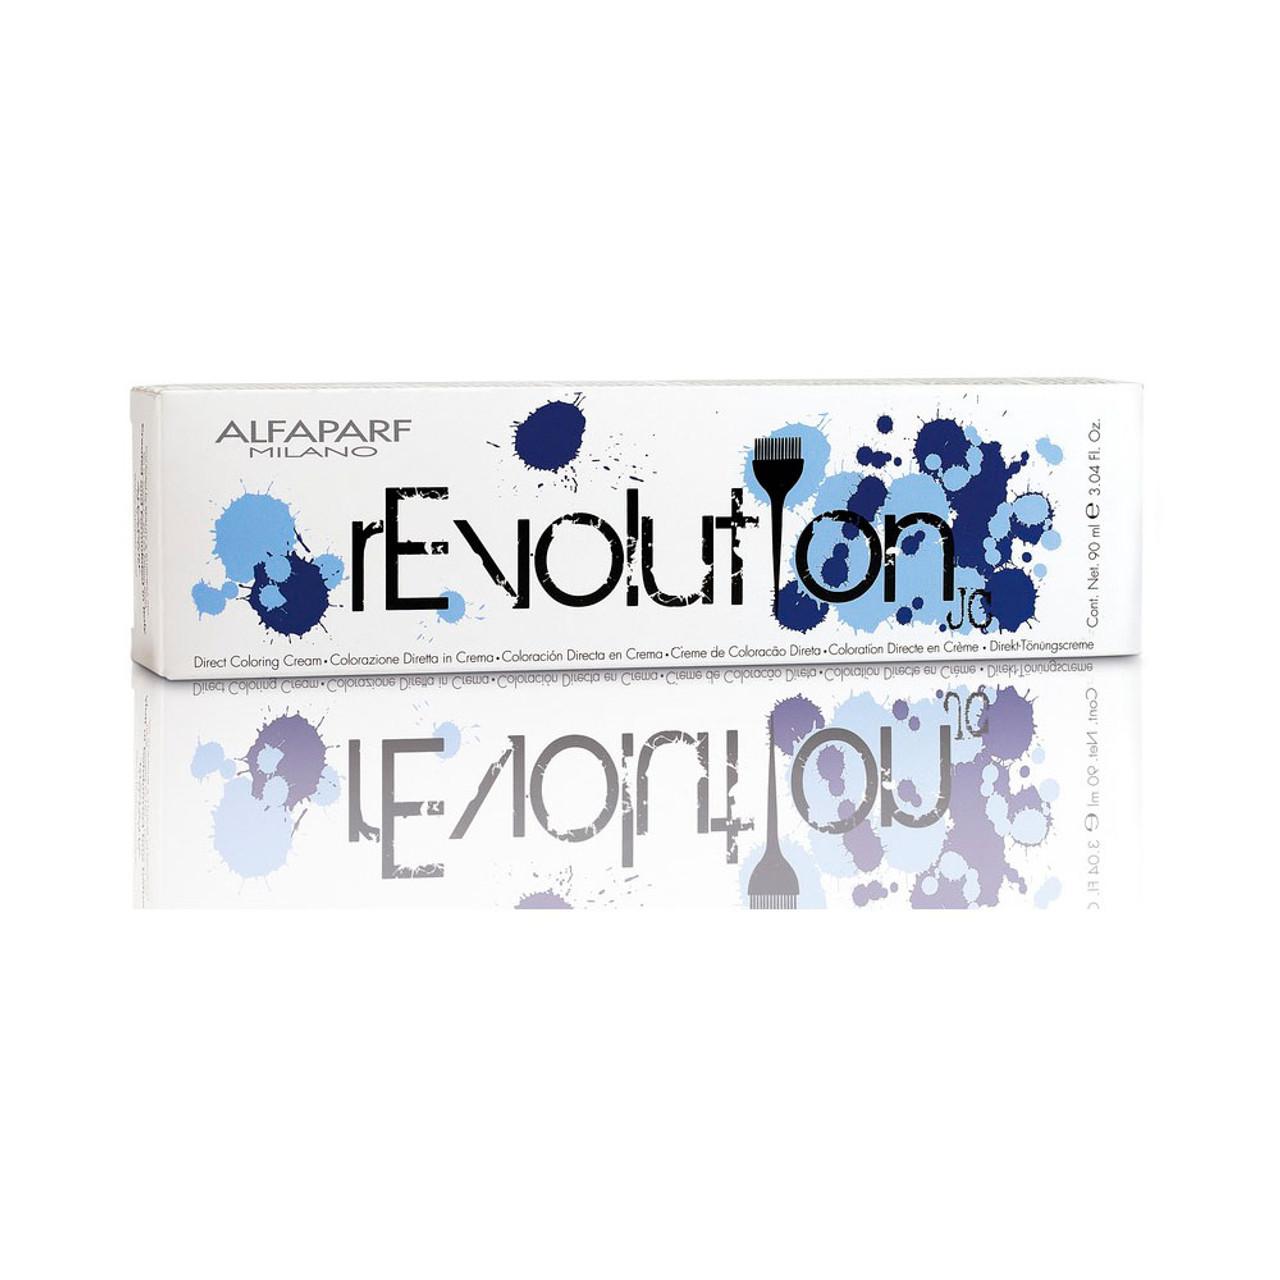 Alfaparf Revolution Jc True Blue Coloring 90ml 3 04fl Oz Bkeratin Professional